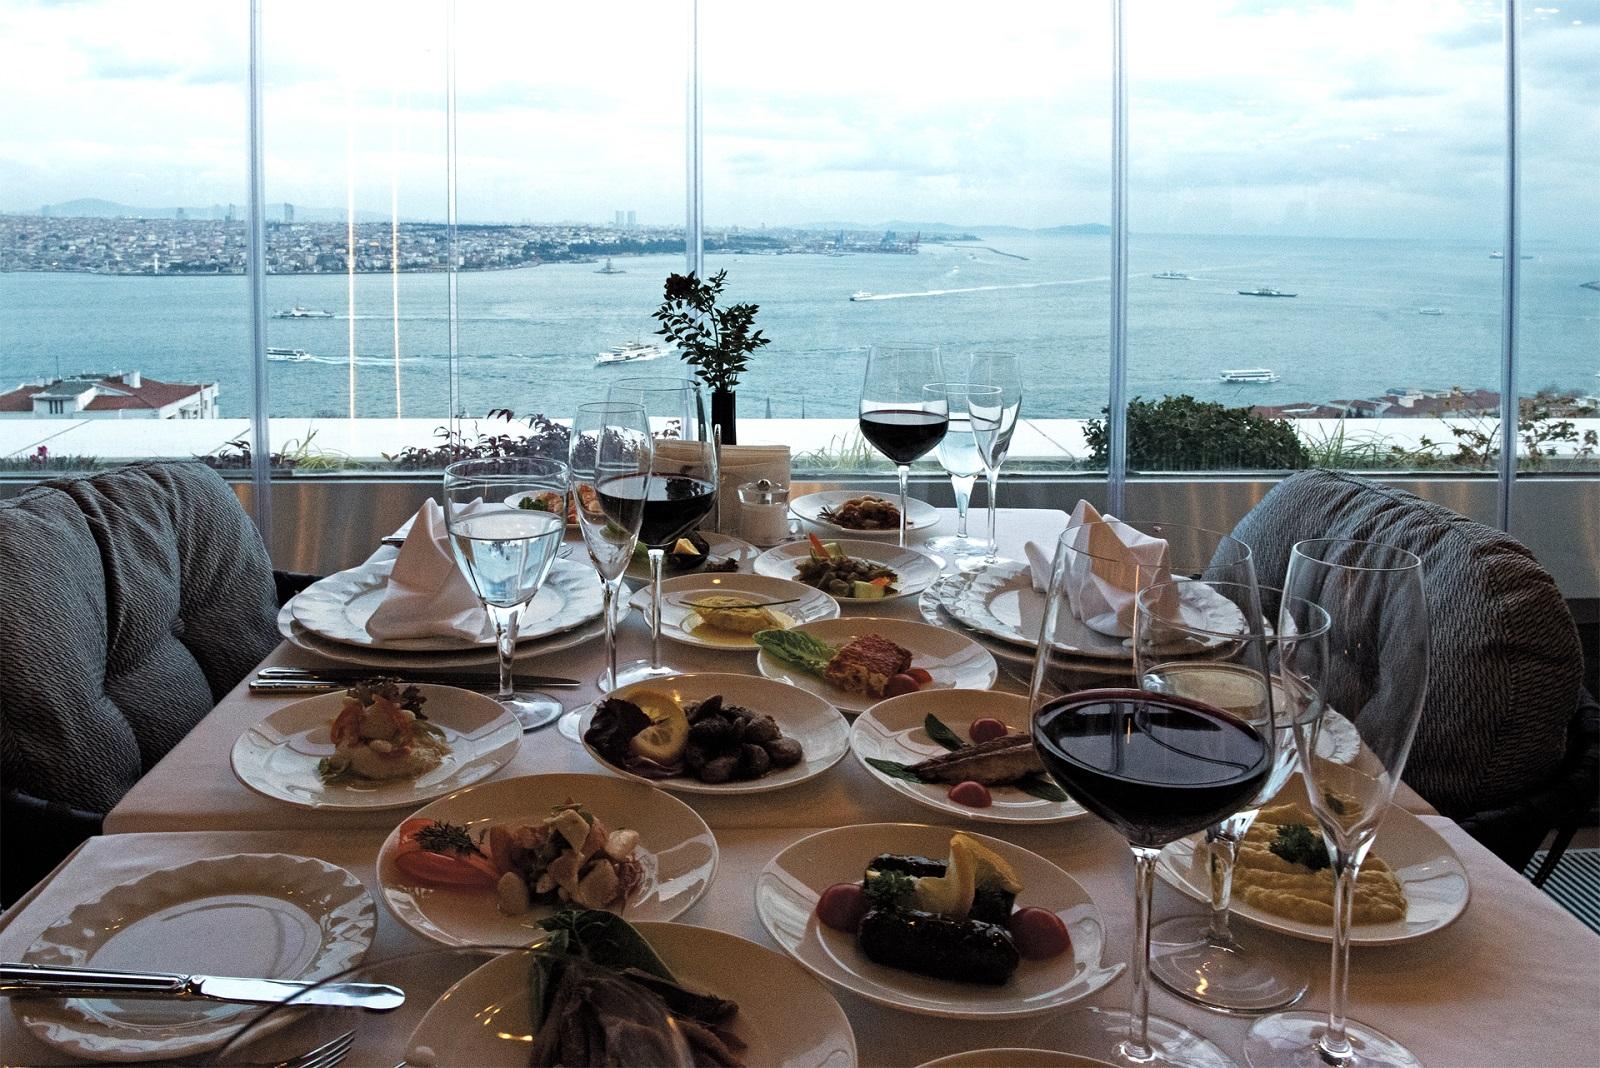 izaka restaurants bar lounge gumussuyu - istanbul - yilbasi mekanlari